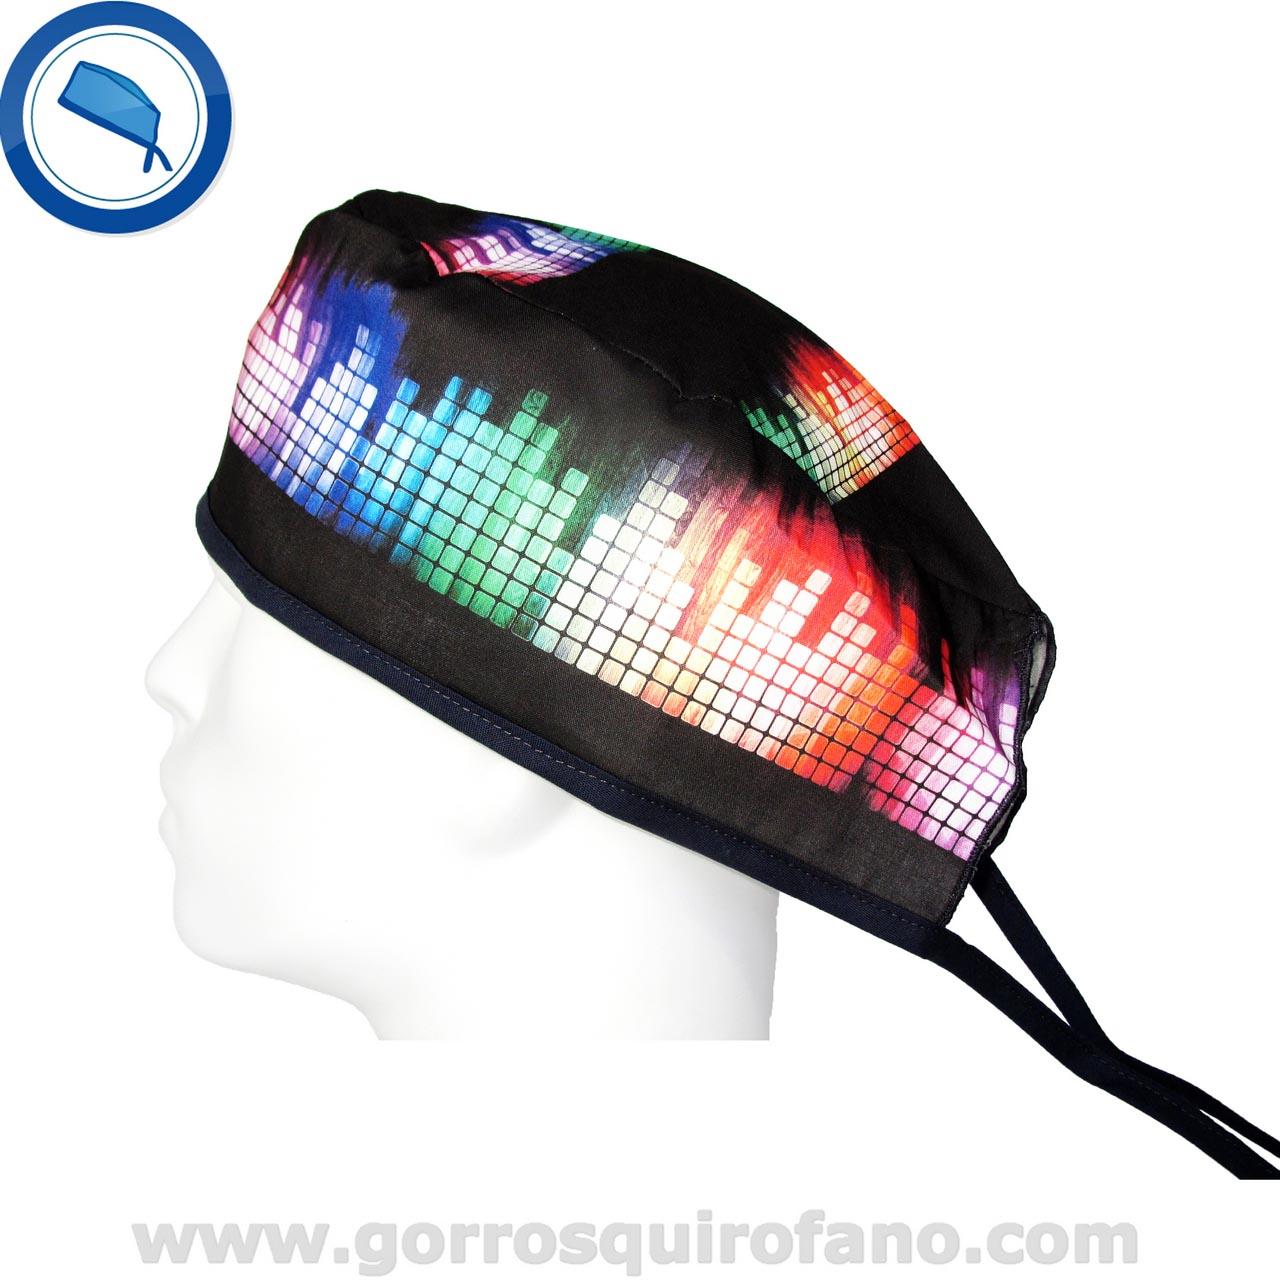 Gorros Quirofano Personalizados Diseños creados por usuarios 1